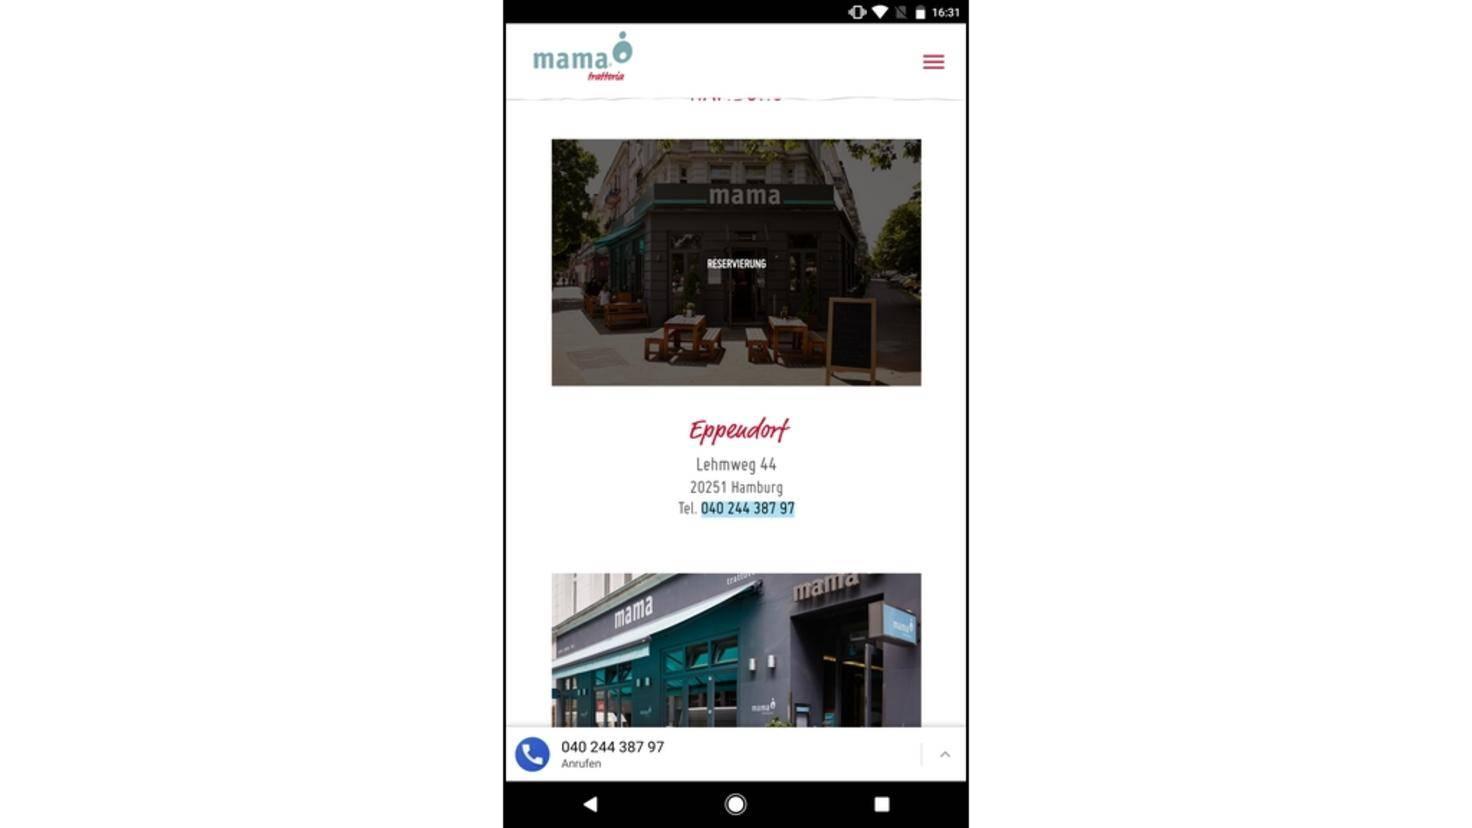 Android-8-Texterkennung